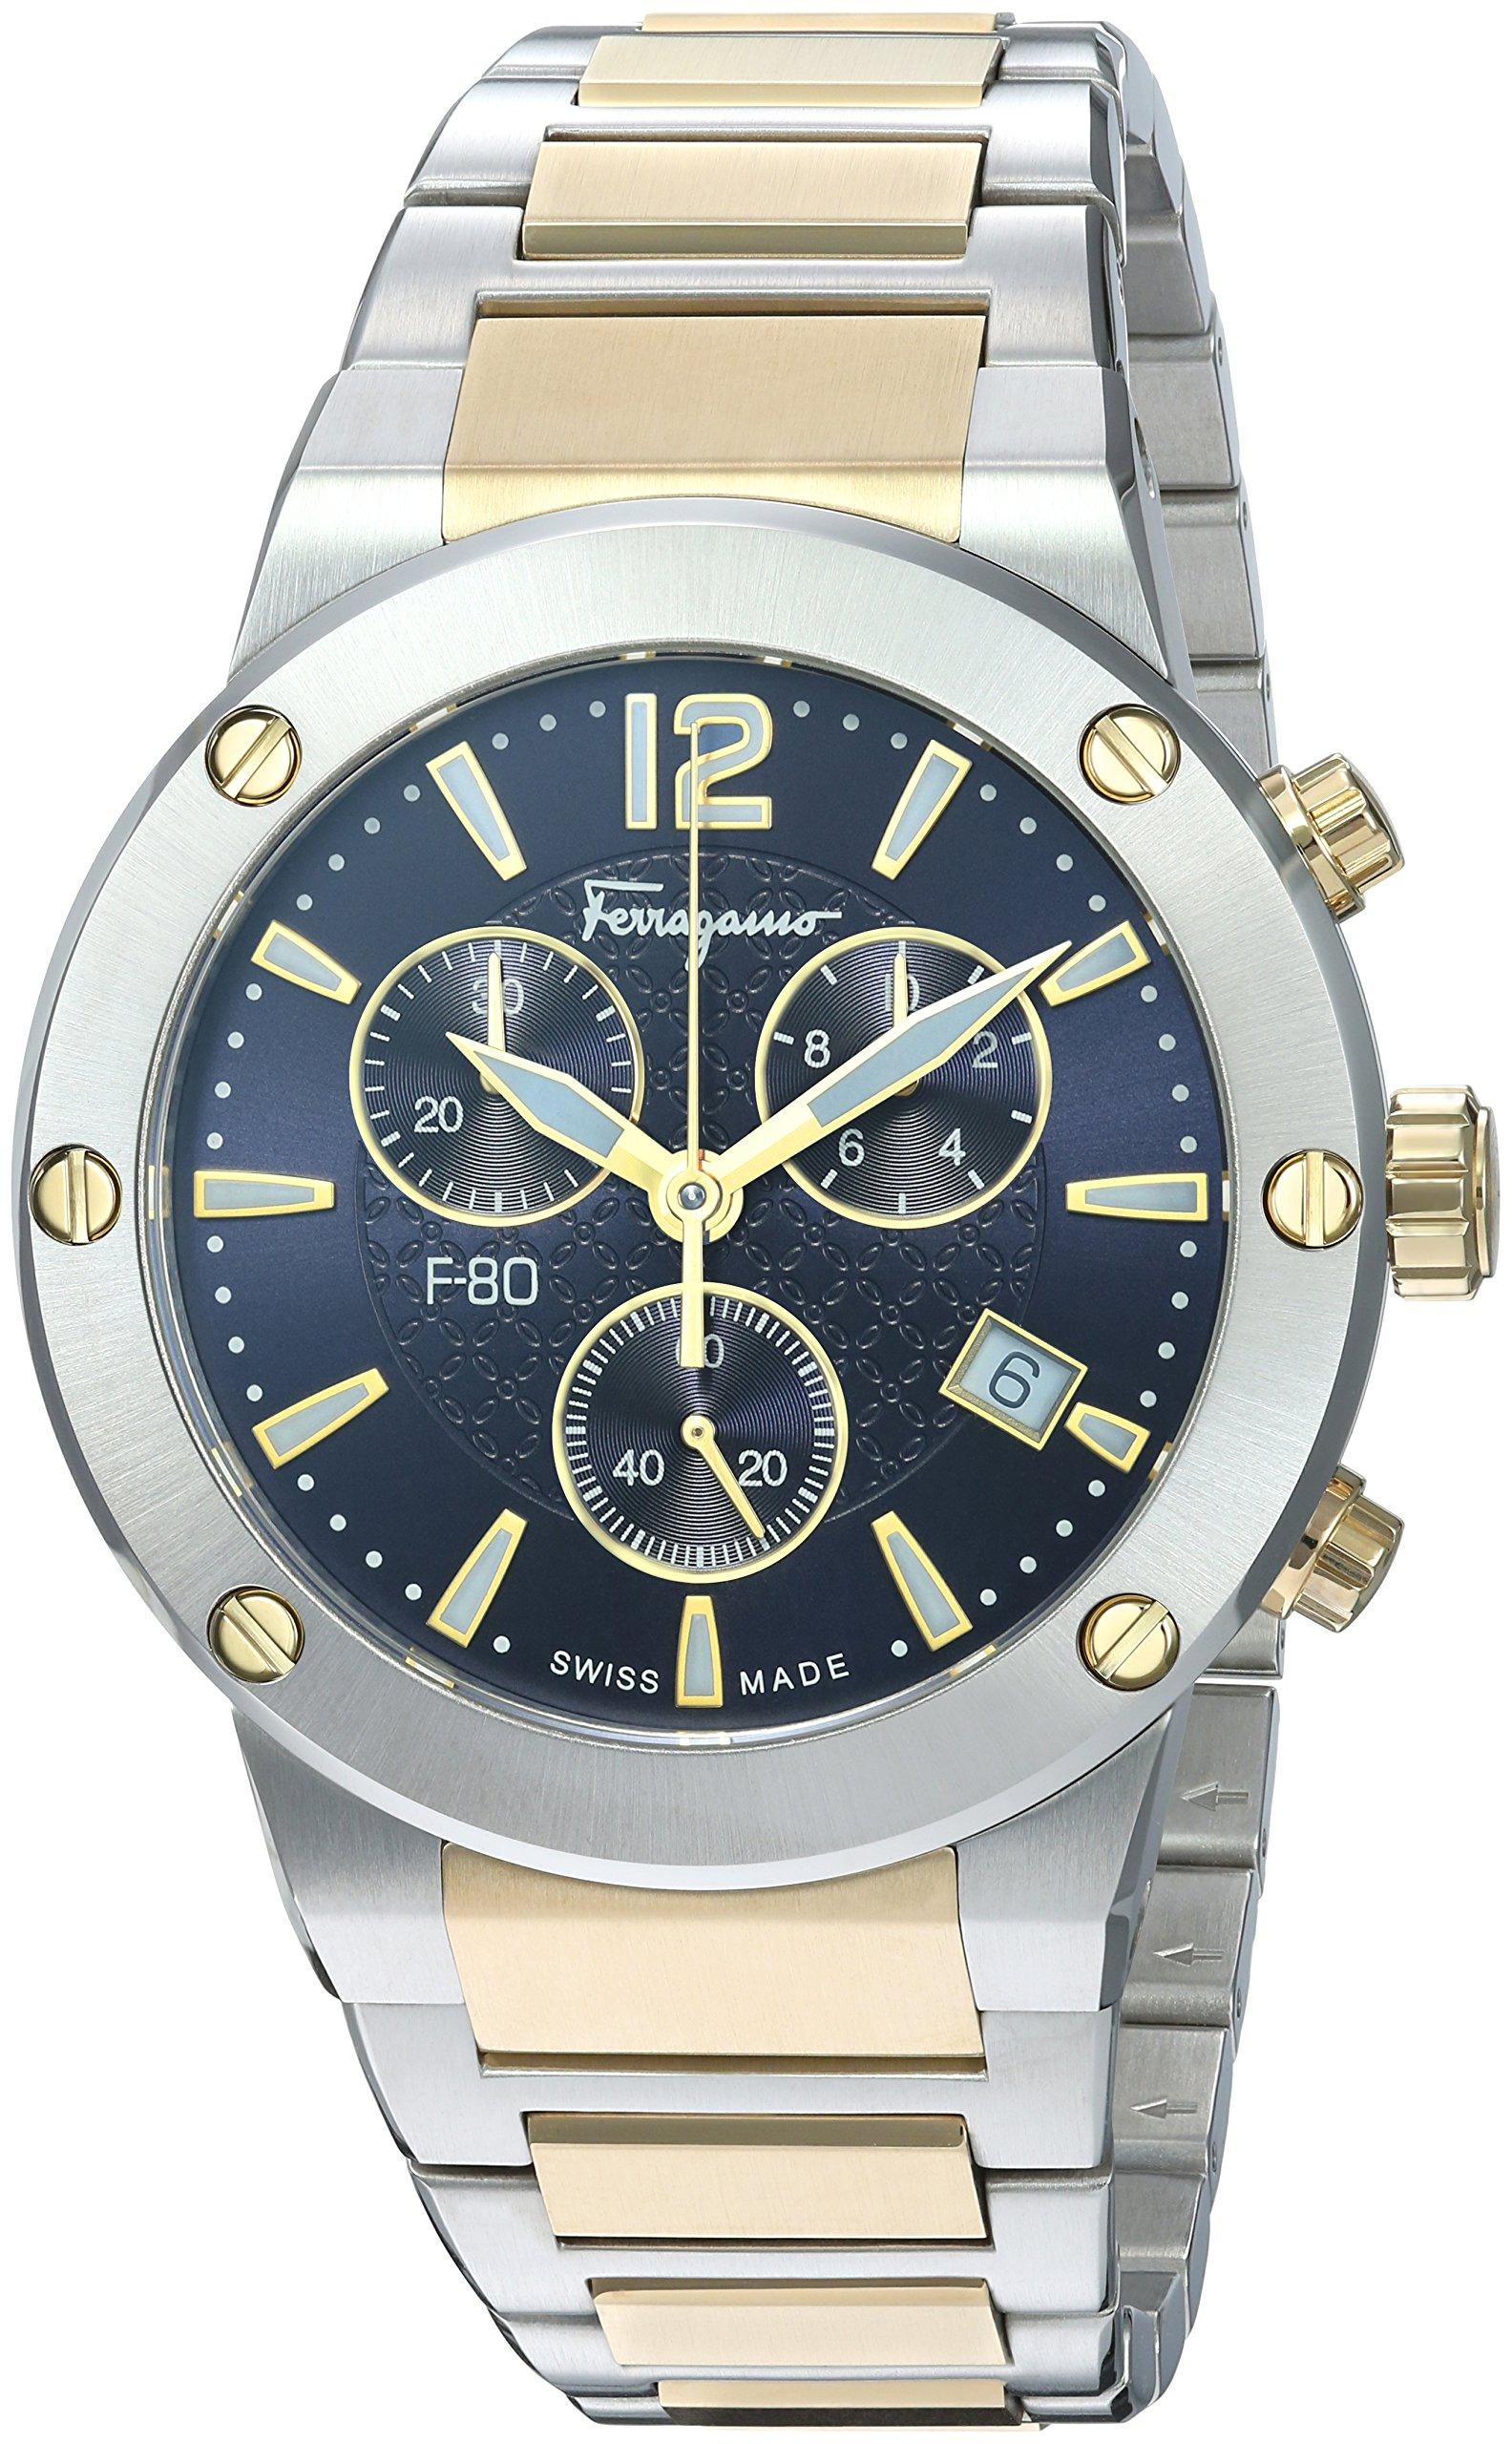 Salvatore Ferragamo Men's 'F-80' Swiss Quartz Stainless Steel Casual Watch, Color:Two Tone (Model: FIJ070017)